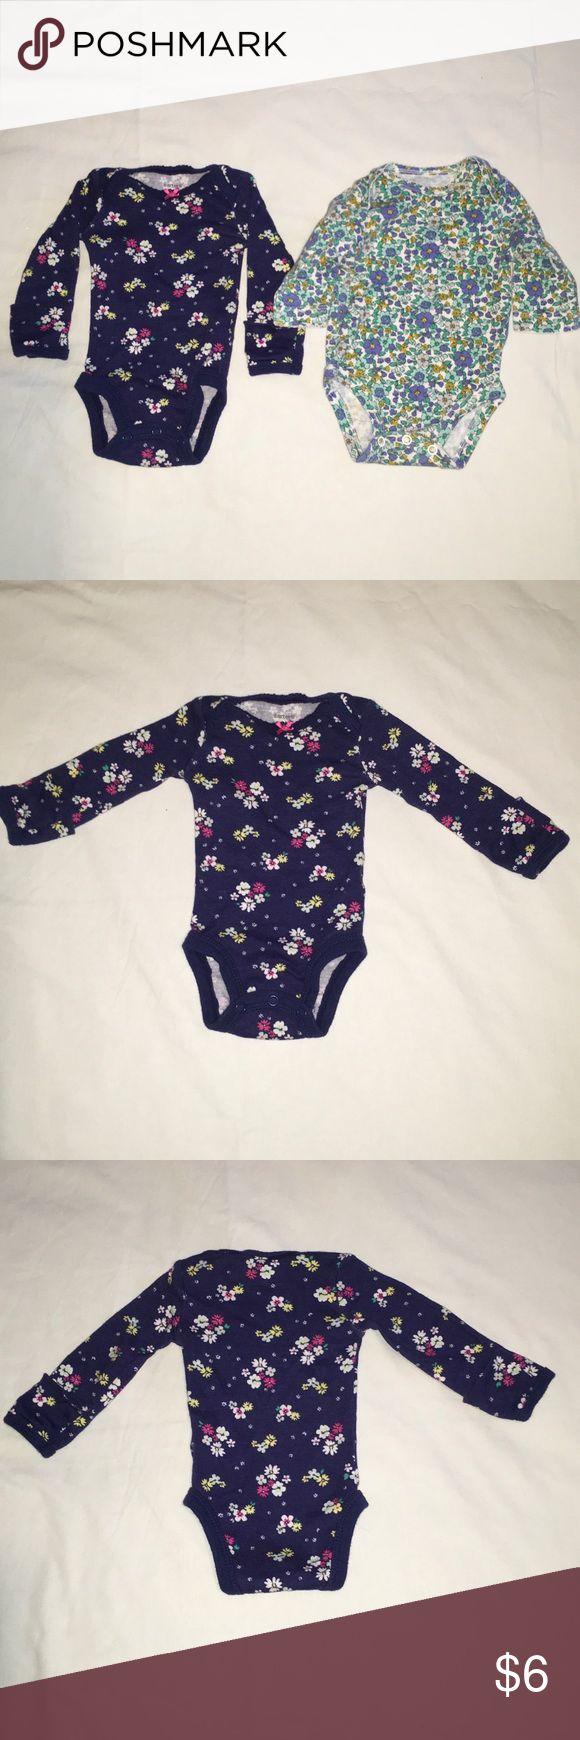 Onesie (set of 2) Navy with flower print mitten onesie, and white with blue/green/olive flower print onesie. Carter's Shirts & Tops